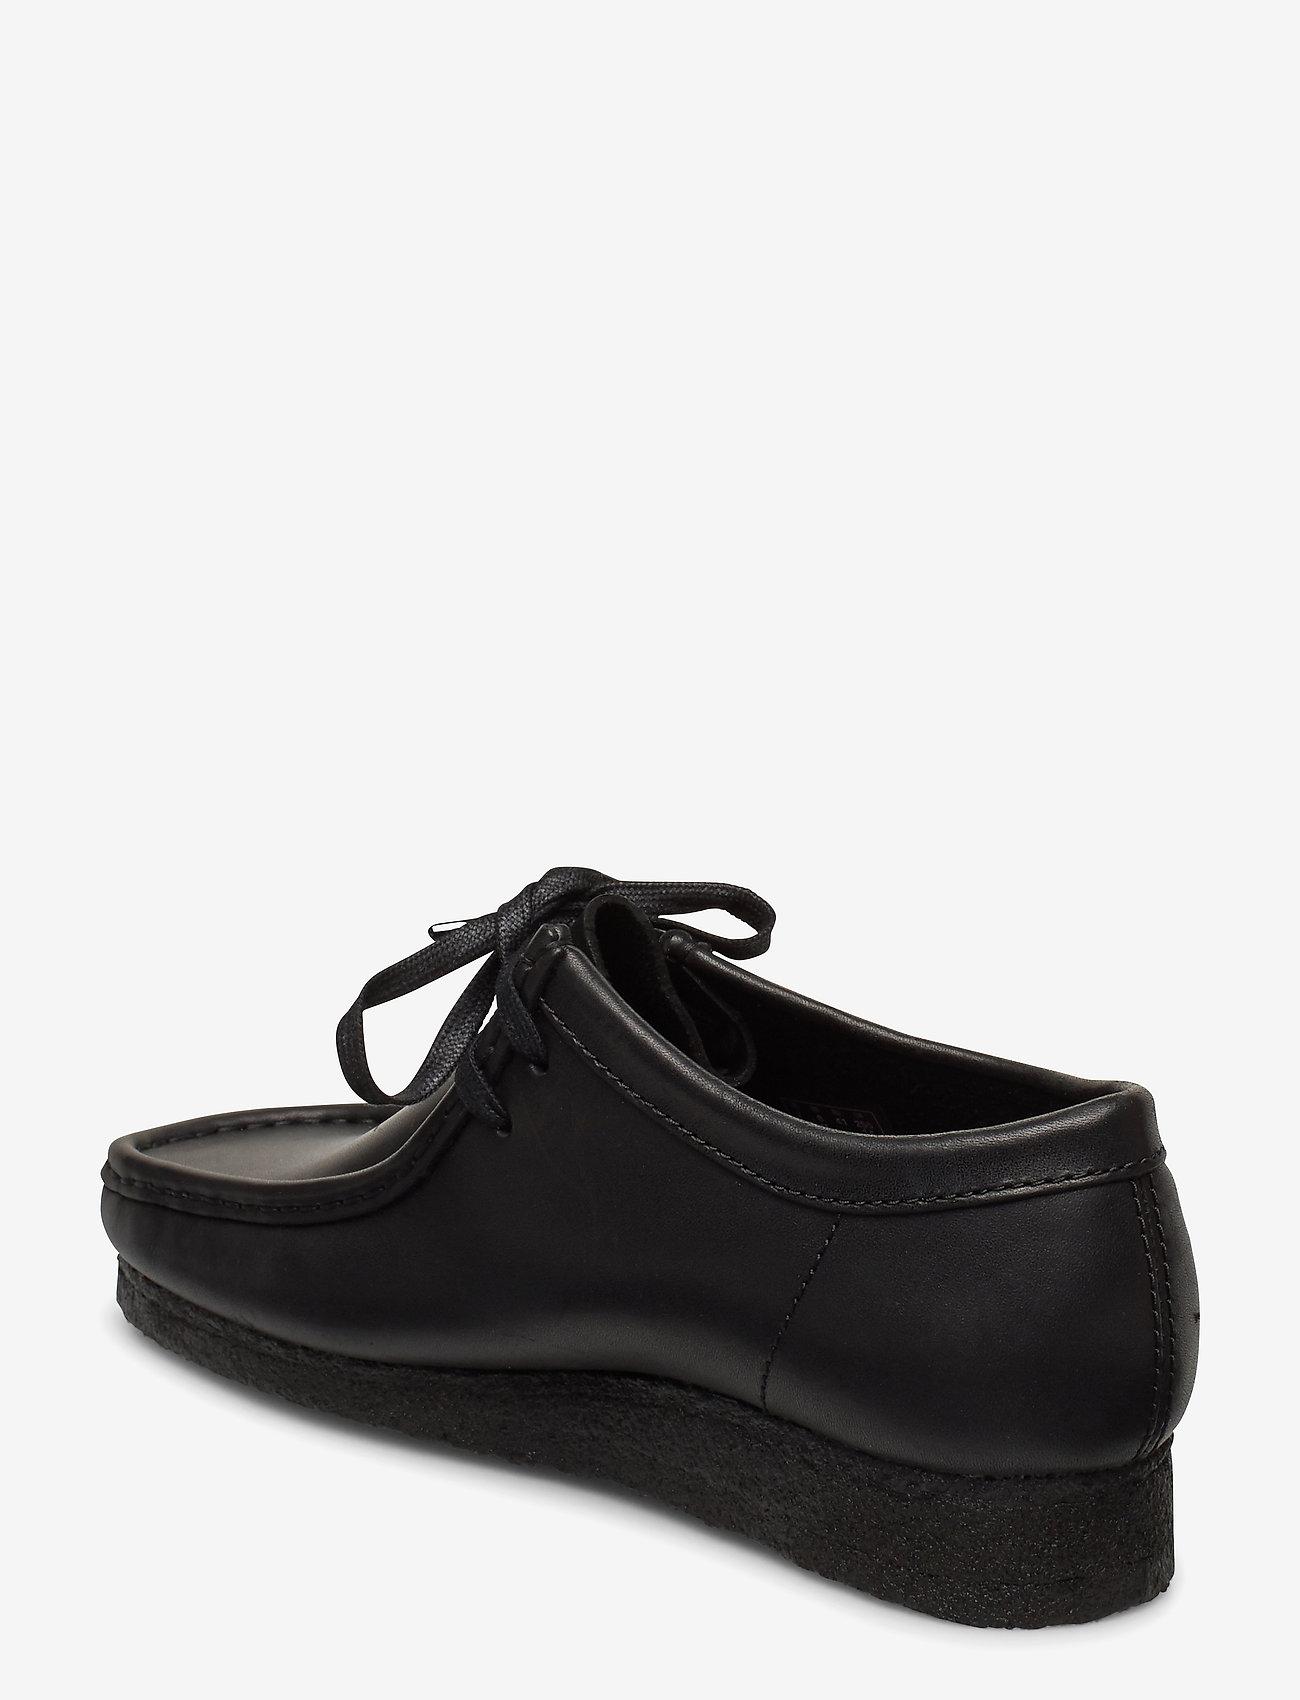 Clarks Originals - Wallabee - snörskor - black leather - 2